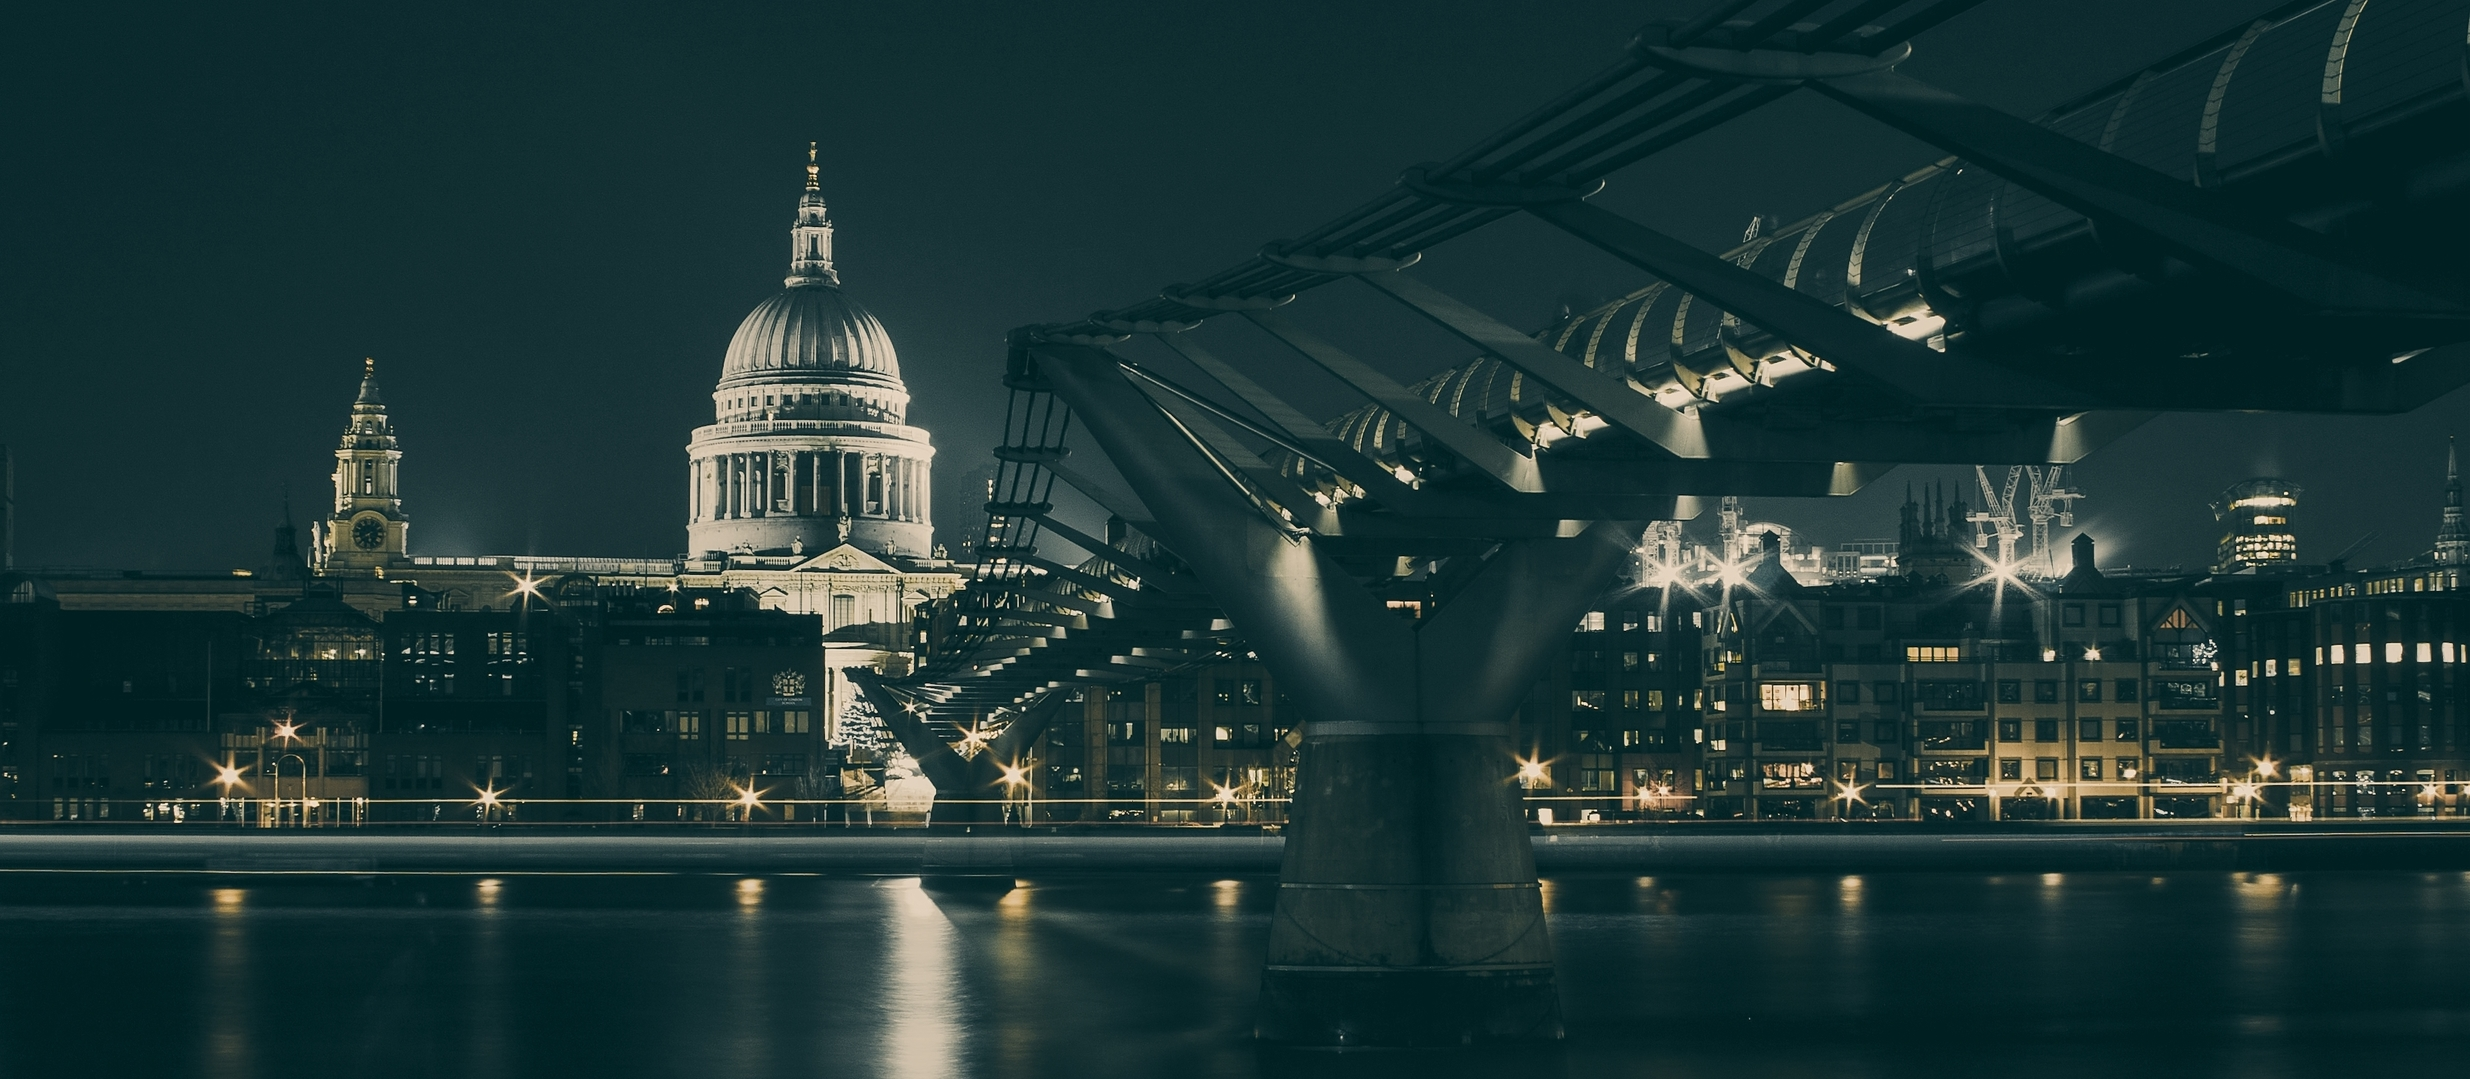 St Paul's - London Designed by Sir Christopher Wren